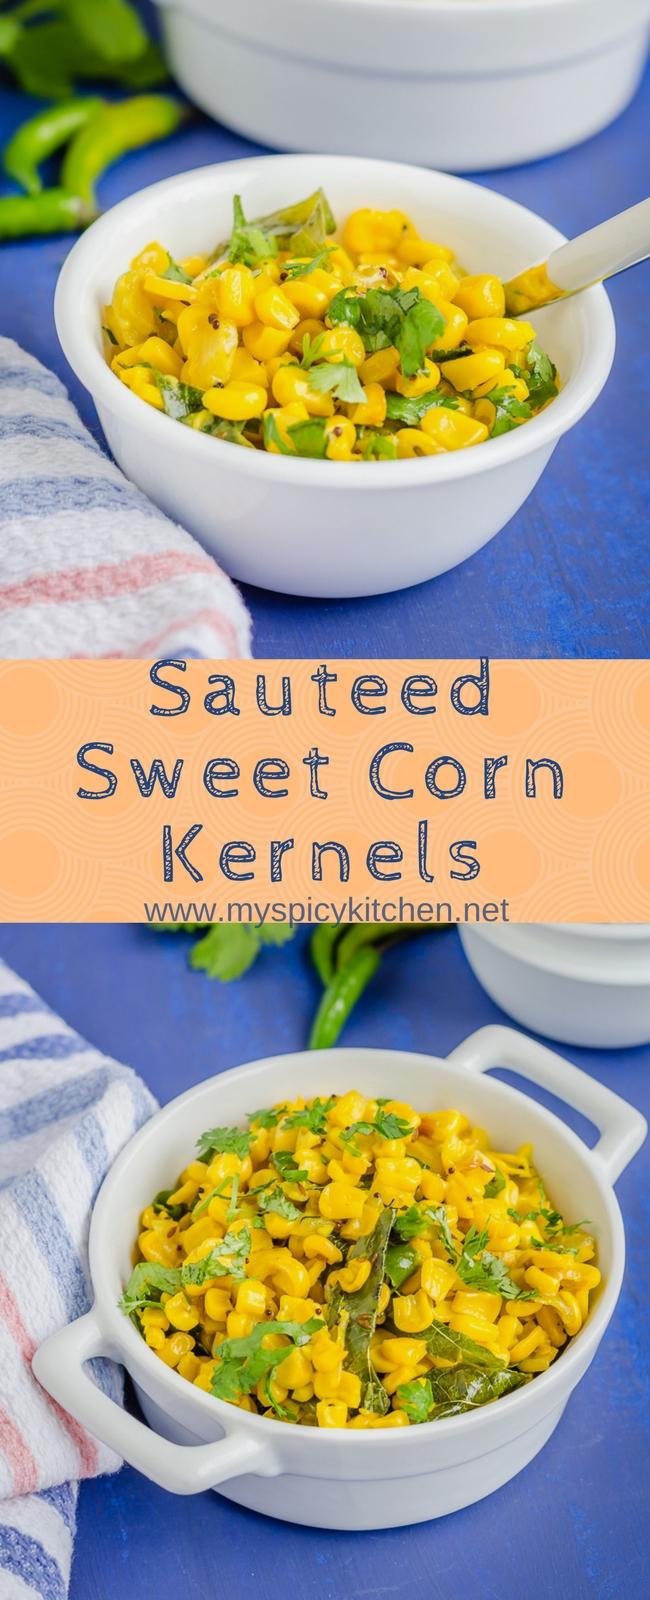 Sweetcorn kernels sauteed with green chilies and garlic.  #Snack #Breakfast #MySpicyKitchen #SweetcornRecipe